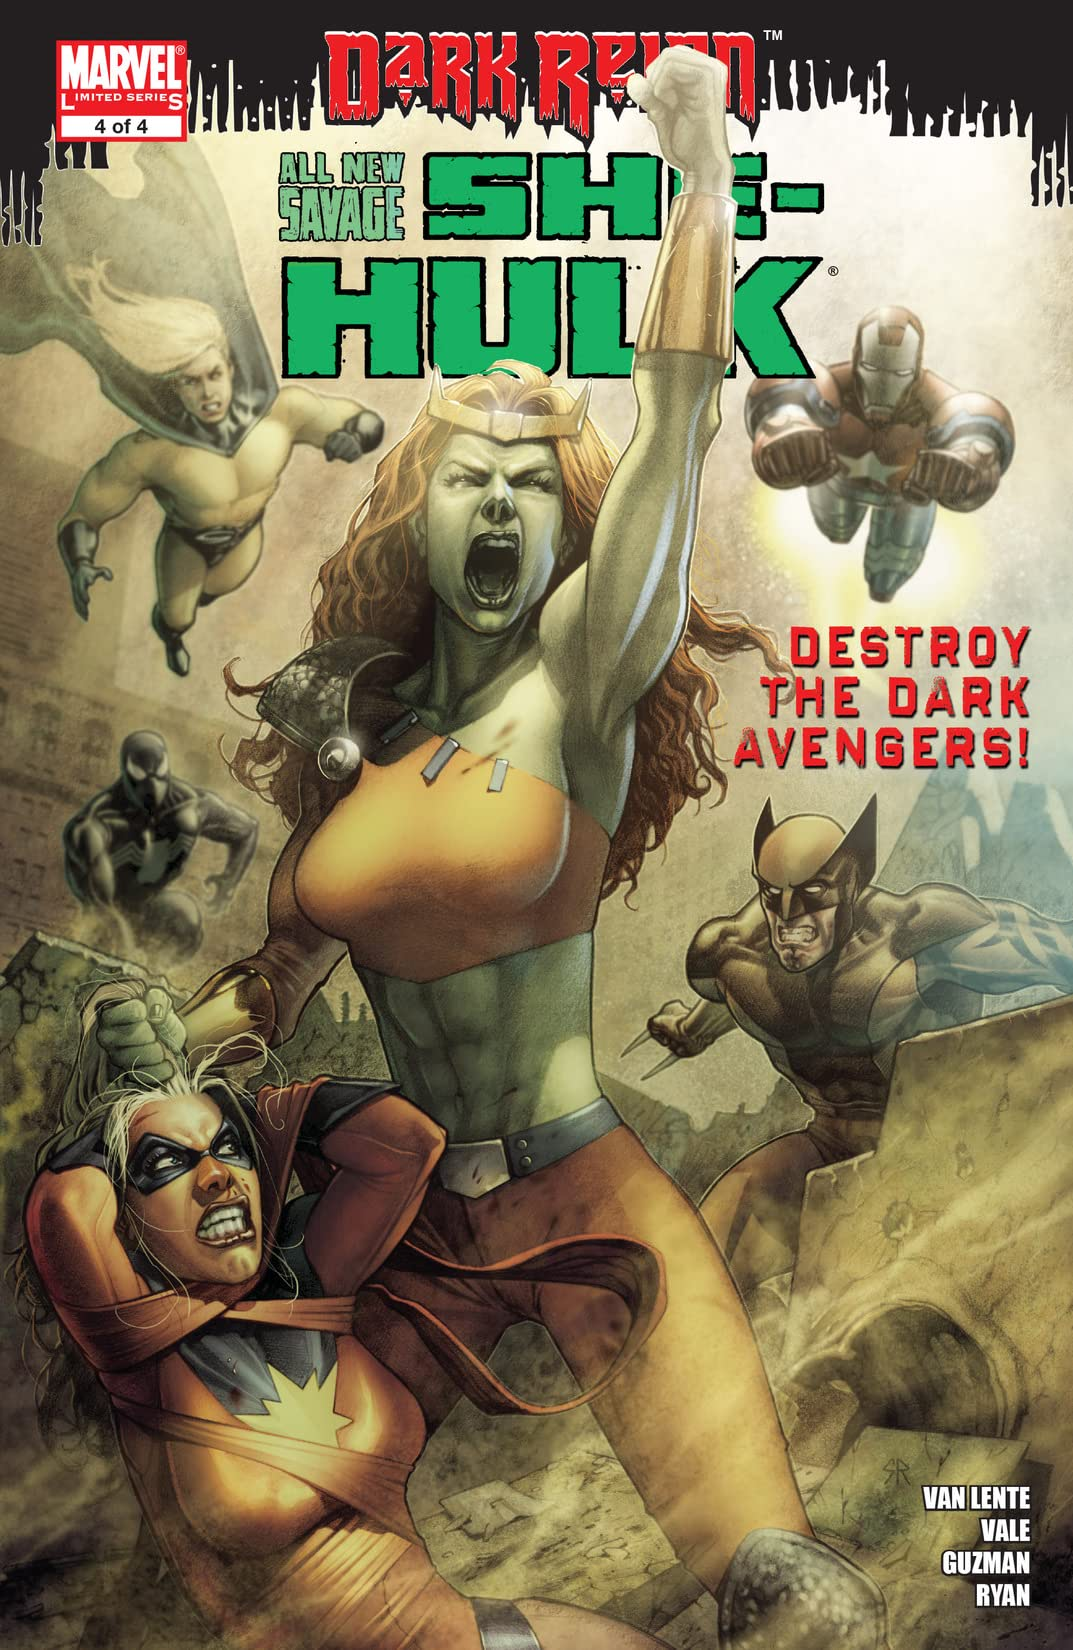 All-New Savage She-Hulk (2009) #4 (of 4)